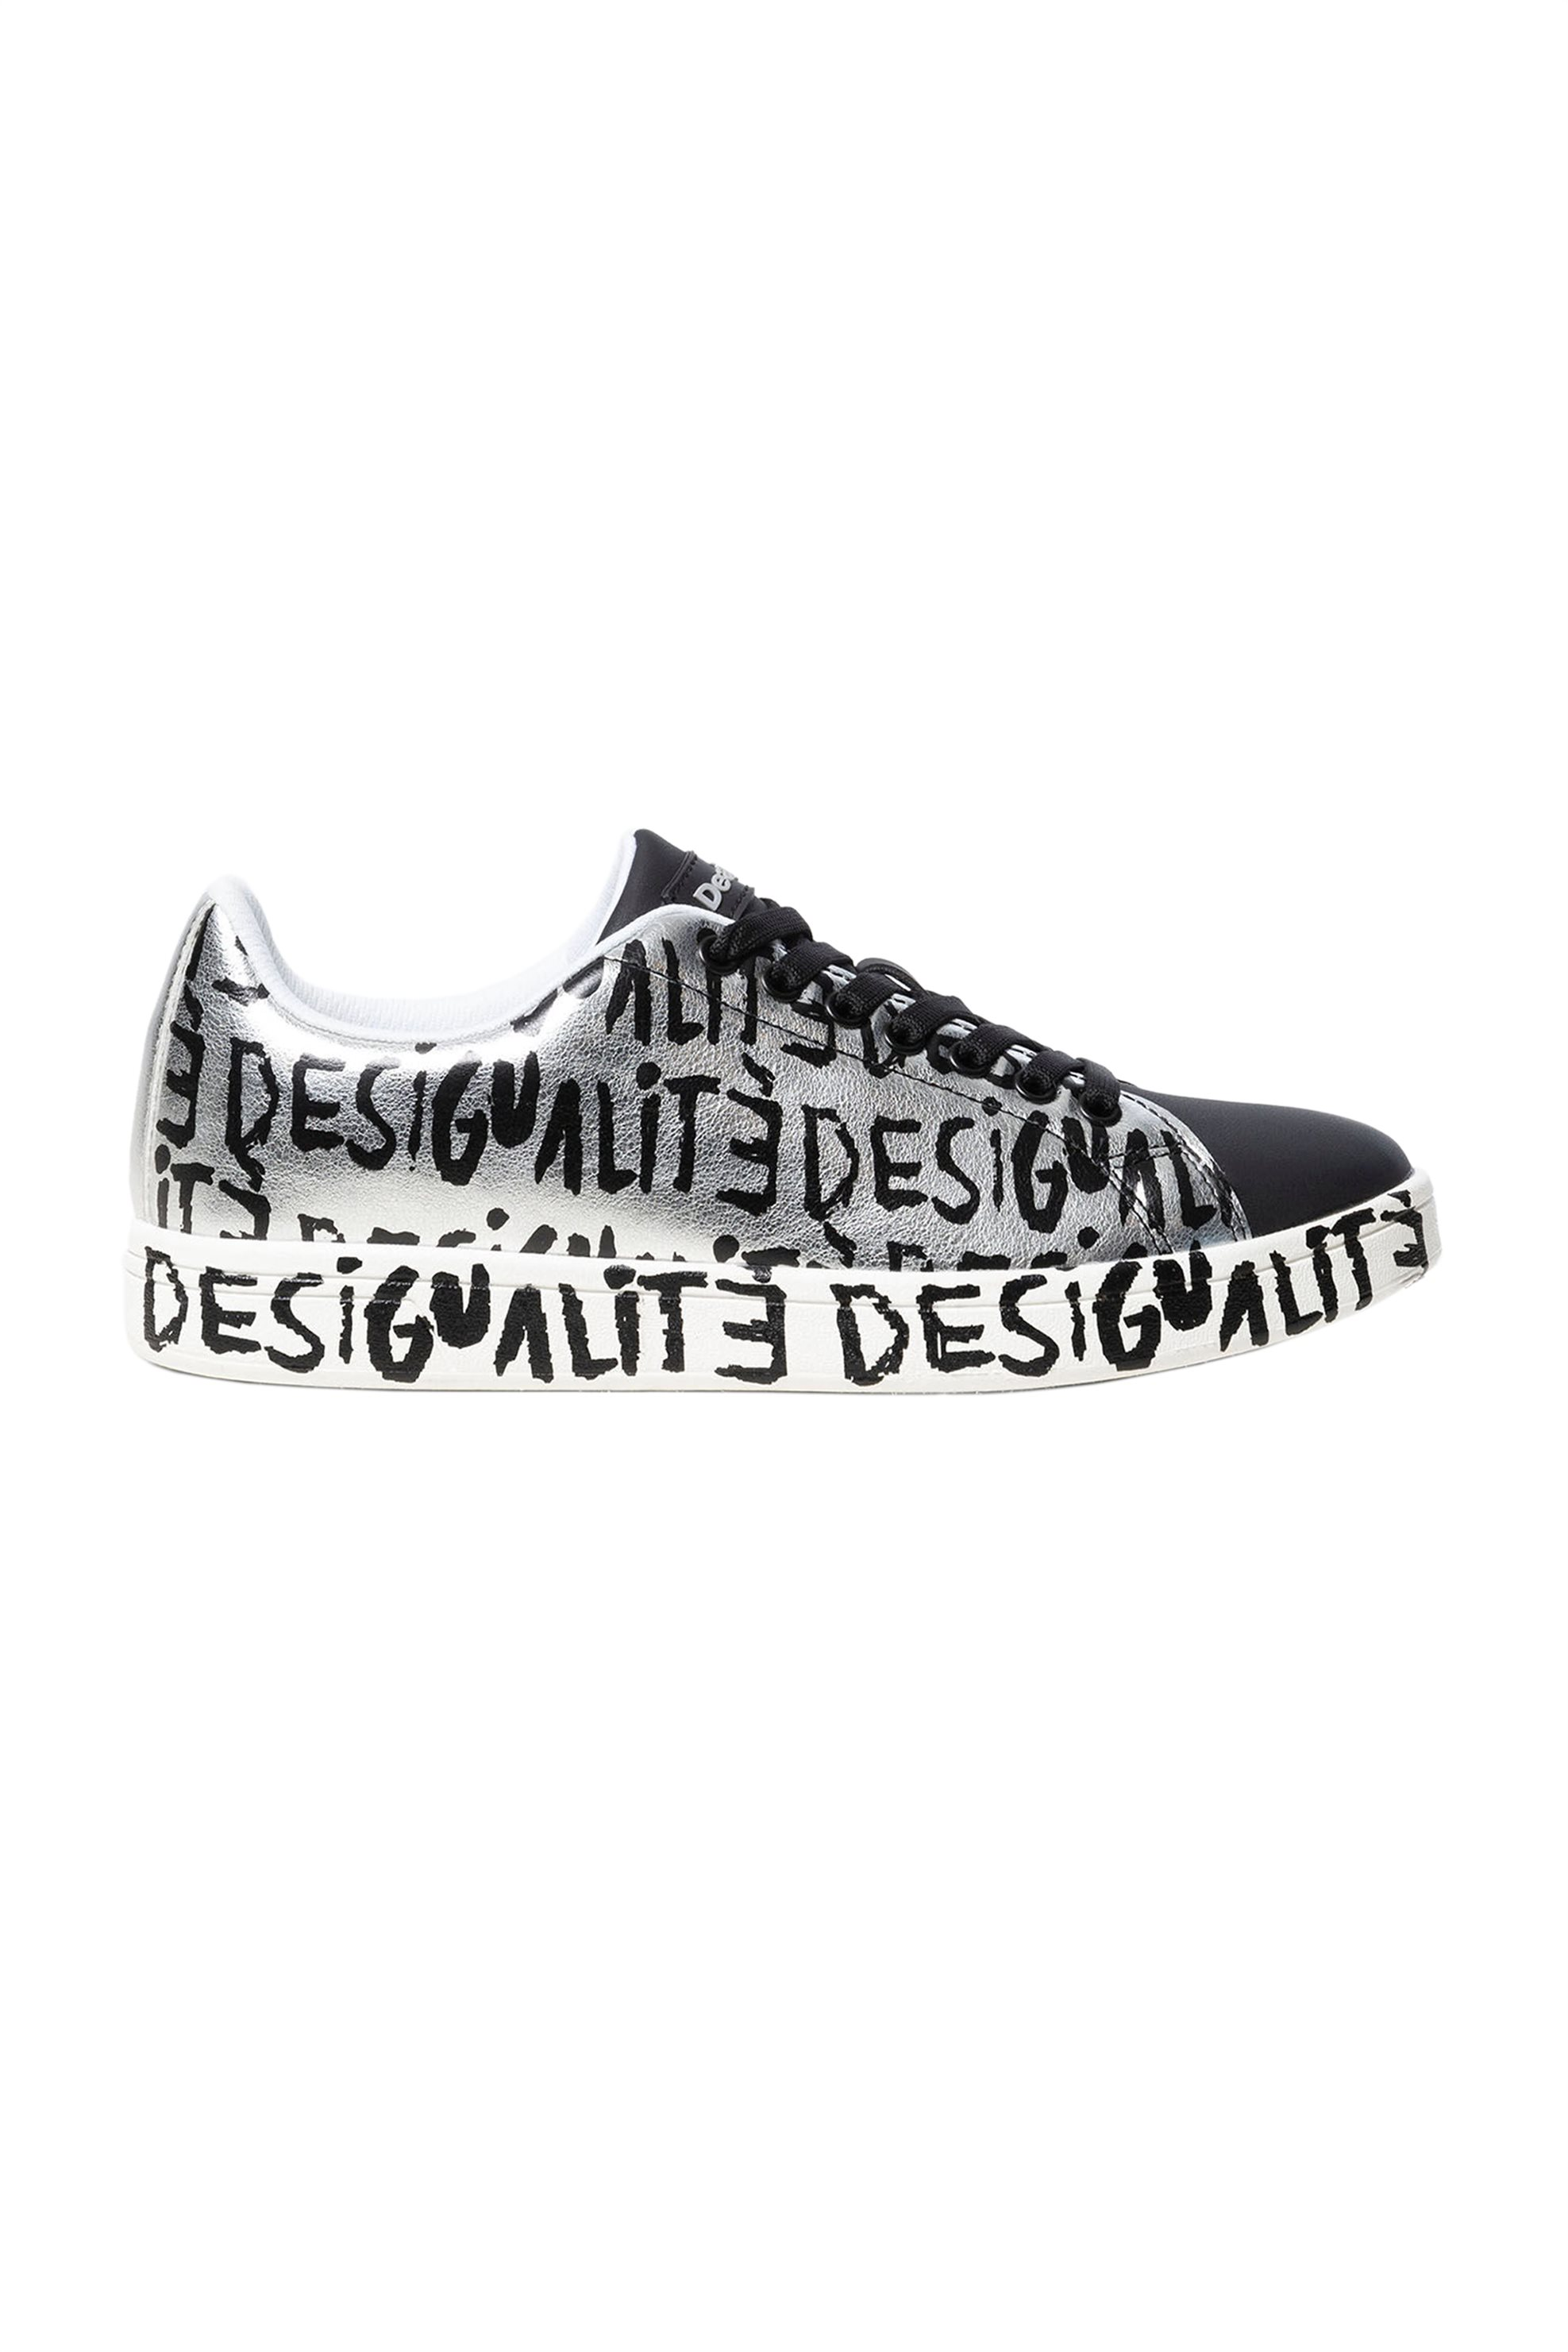 "Desigual γυναικεία sneakers μεταλλιζέ με letter print ""Cosmic Desigualite"" - 19WSKP02 - Ασημί"